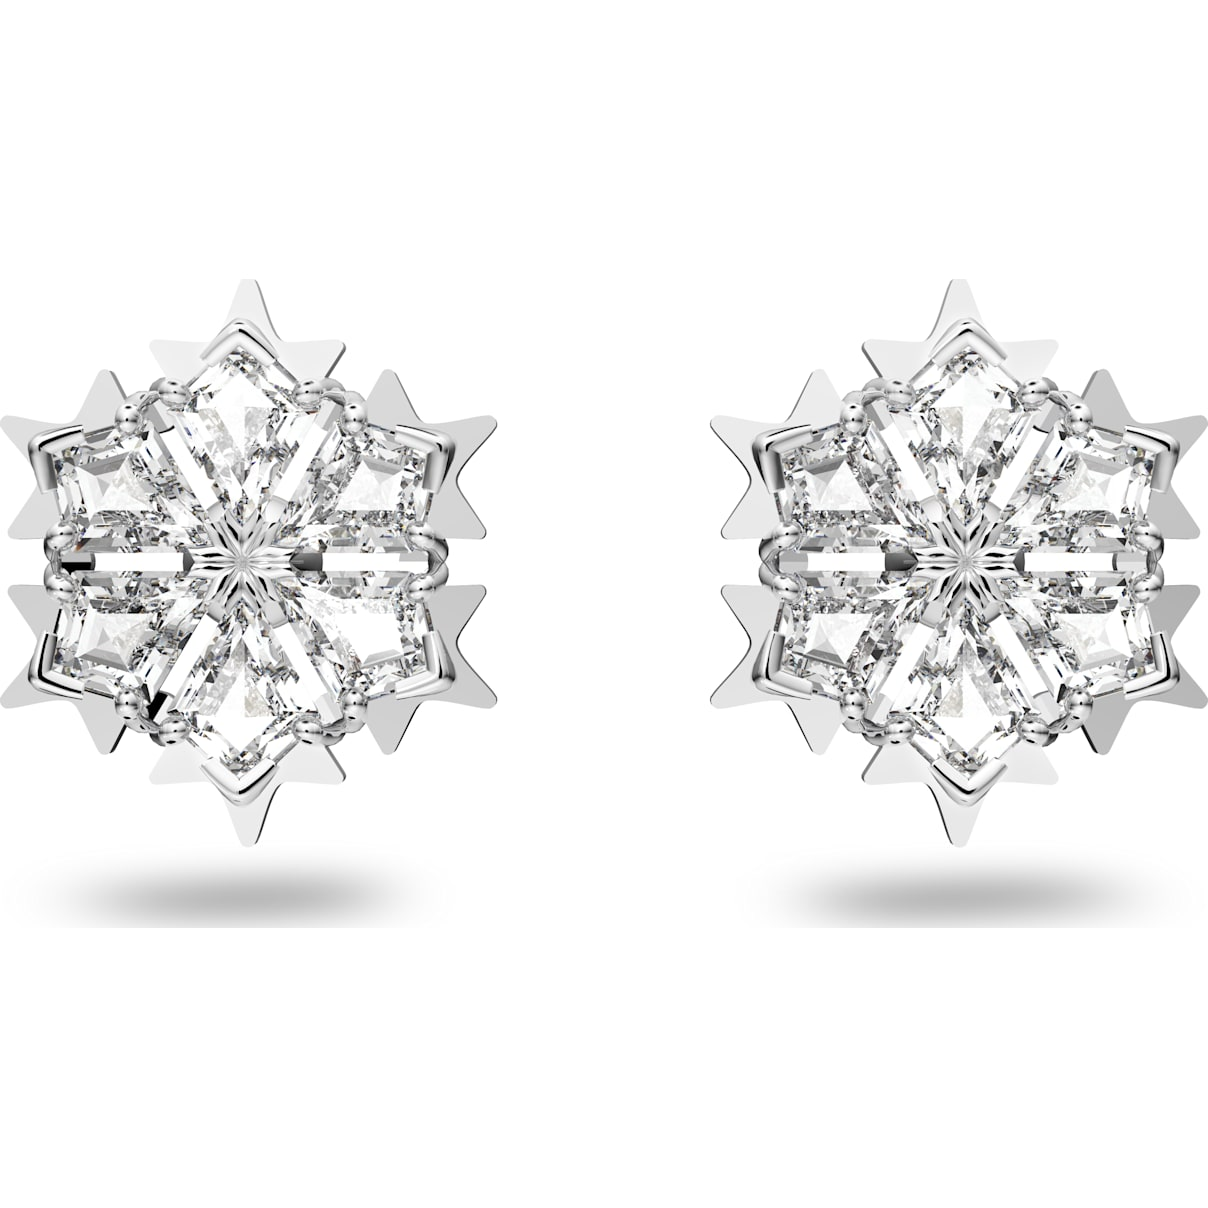 Swarovski Magic Pierced Earrings, White, Rhodium plated